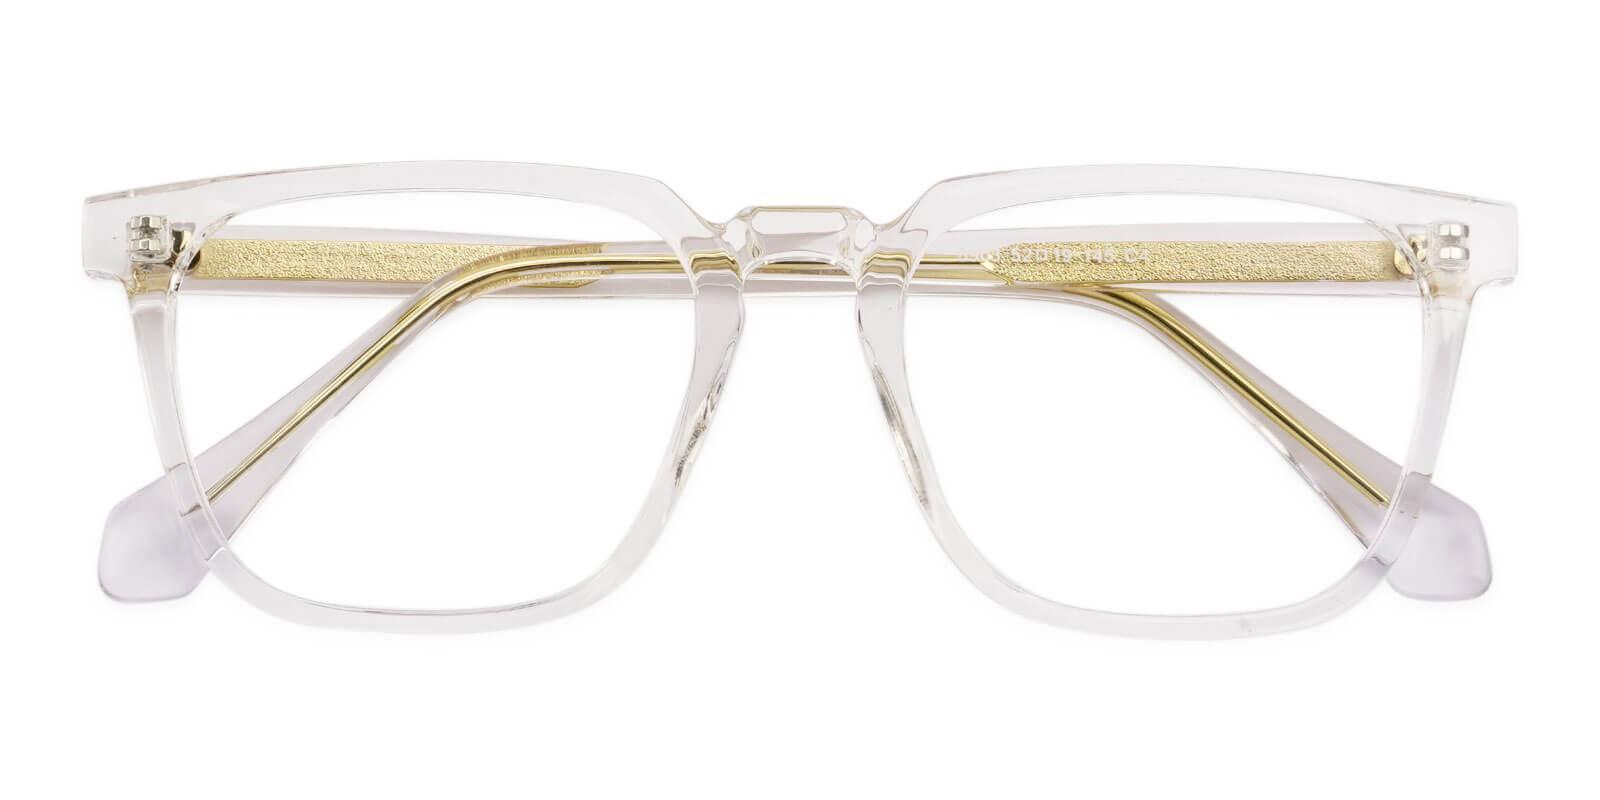 Oriana Translucent Acetate Eyeglasses , SpringHinges , UniversalBridgeFit Frames from ABBE Glasses